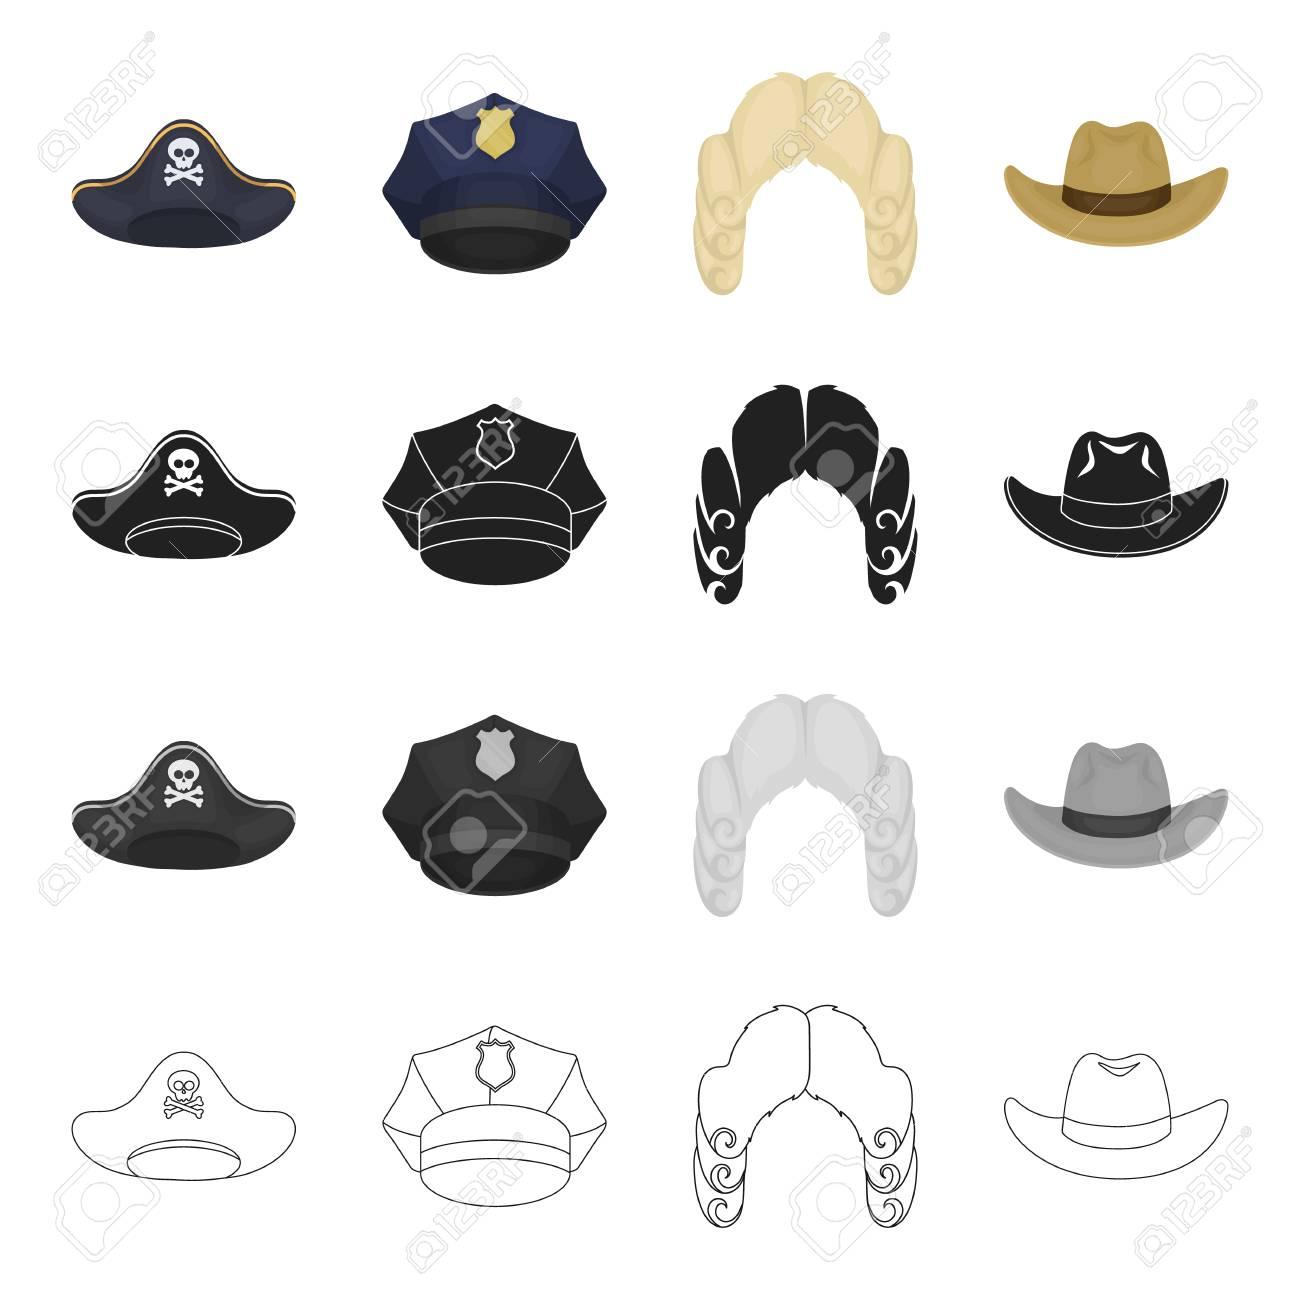 c84605d2095 A pirate's cocked hat, a police cap, a judge's wig, a cowboy...